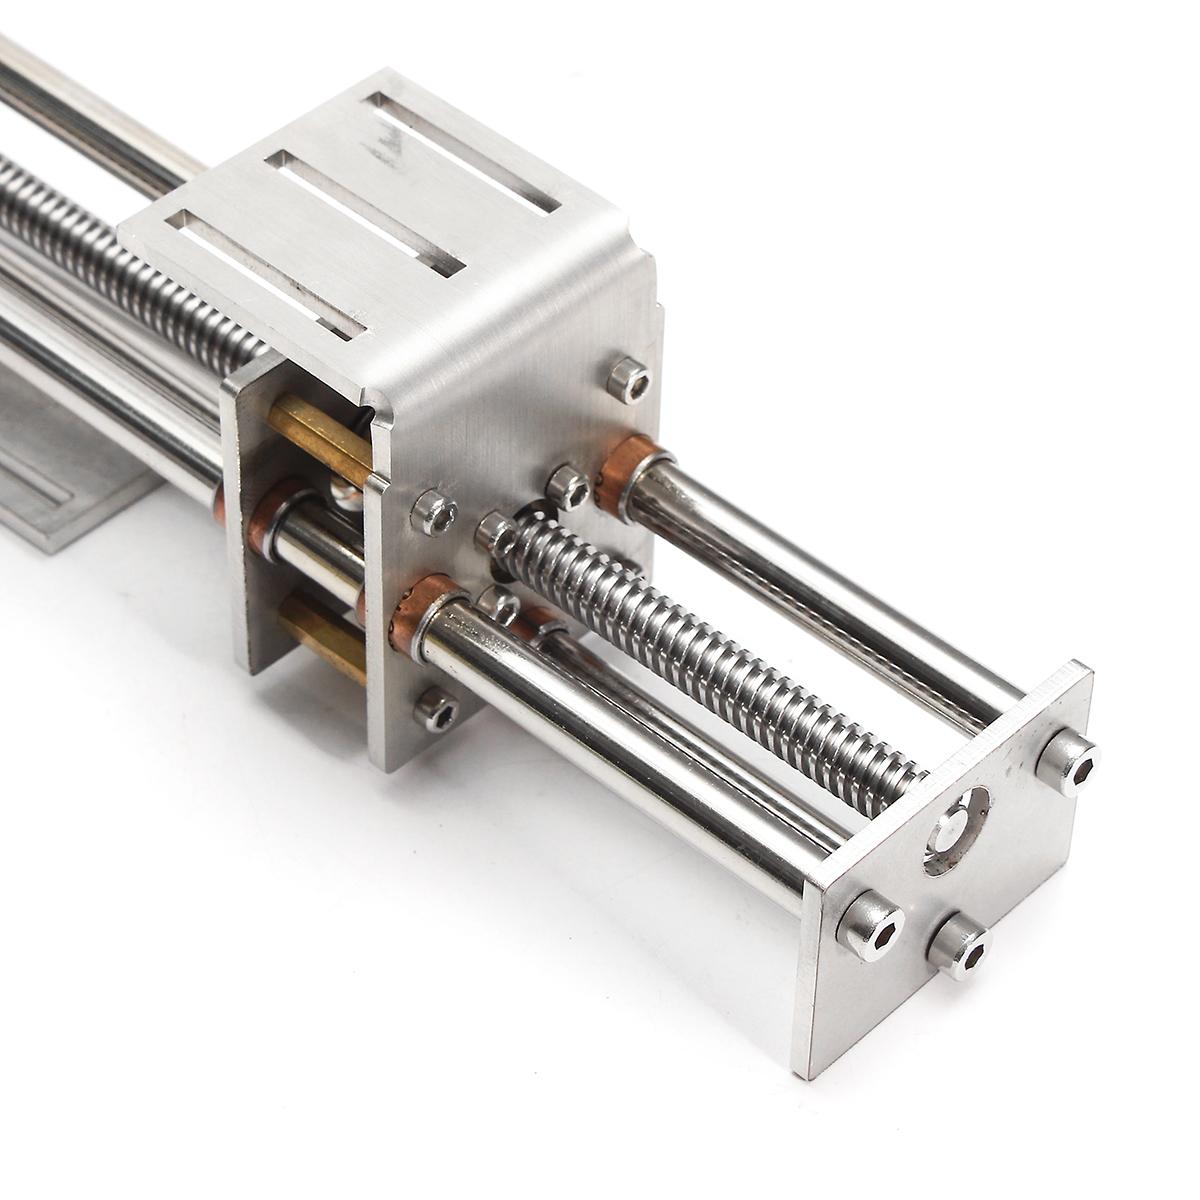 Mini CNC Z Axis Slide 150MM DIY Linear Motion Milling 3